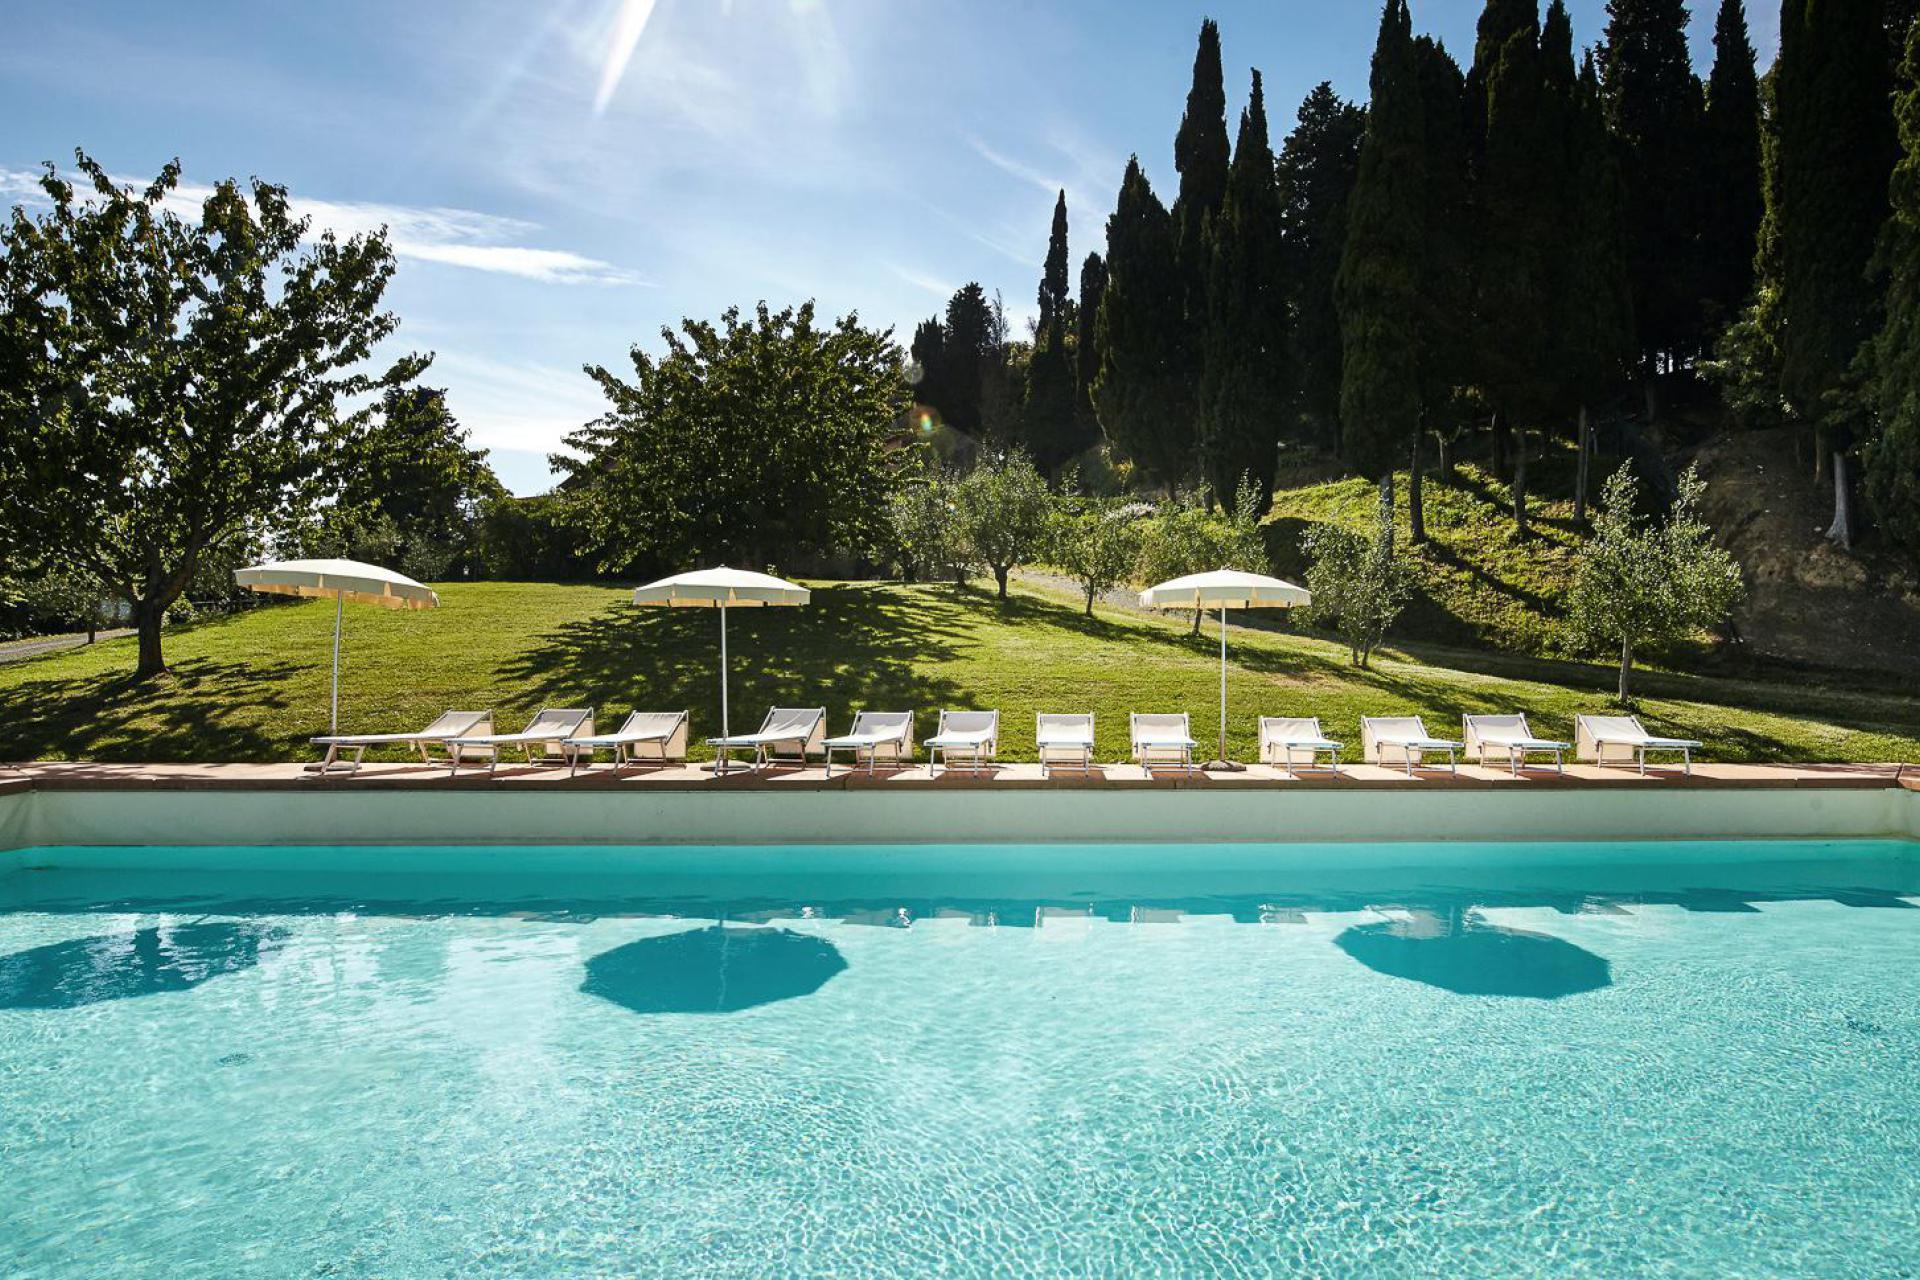 Agriturismo Toscane Familievriendelijke agriturismo is het hart van Toscane